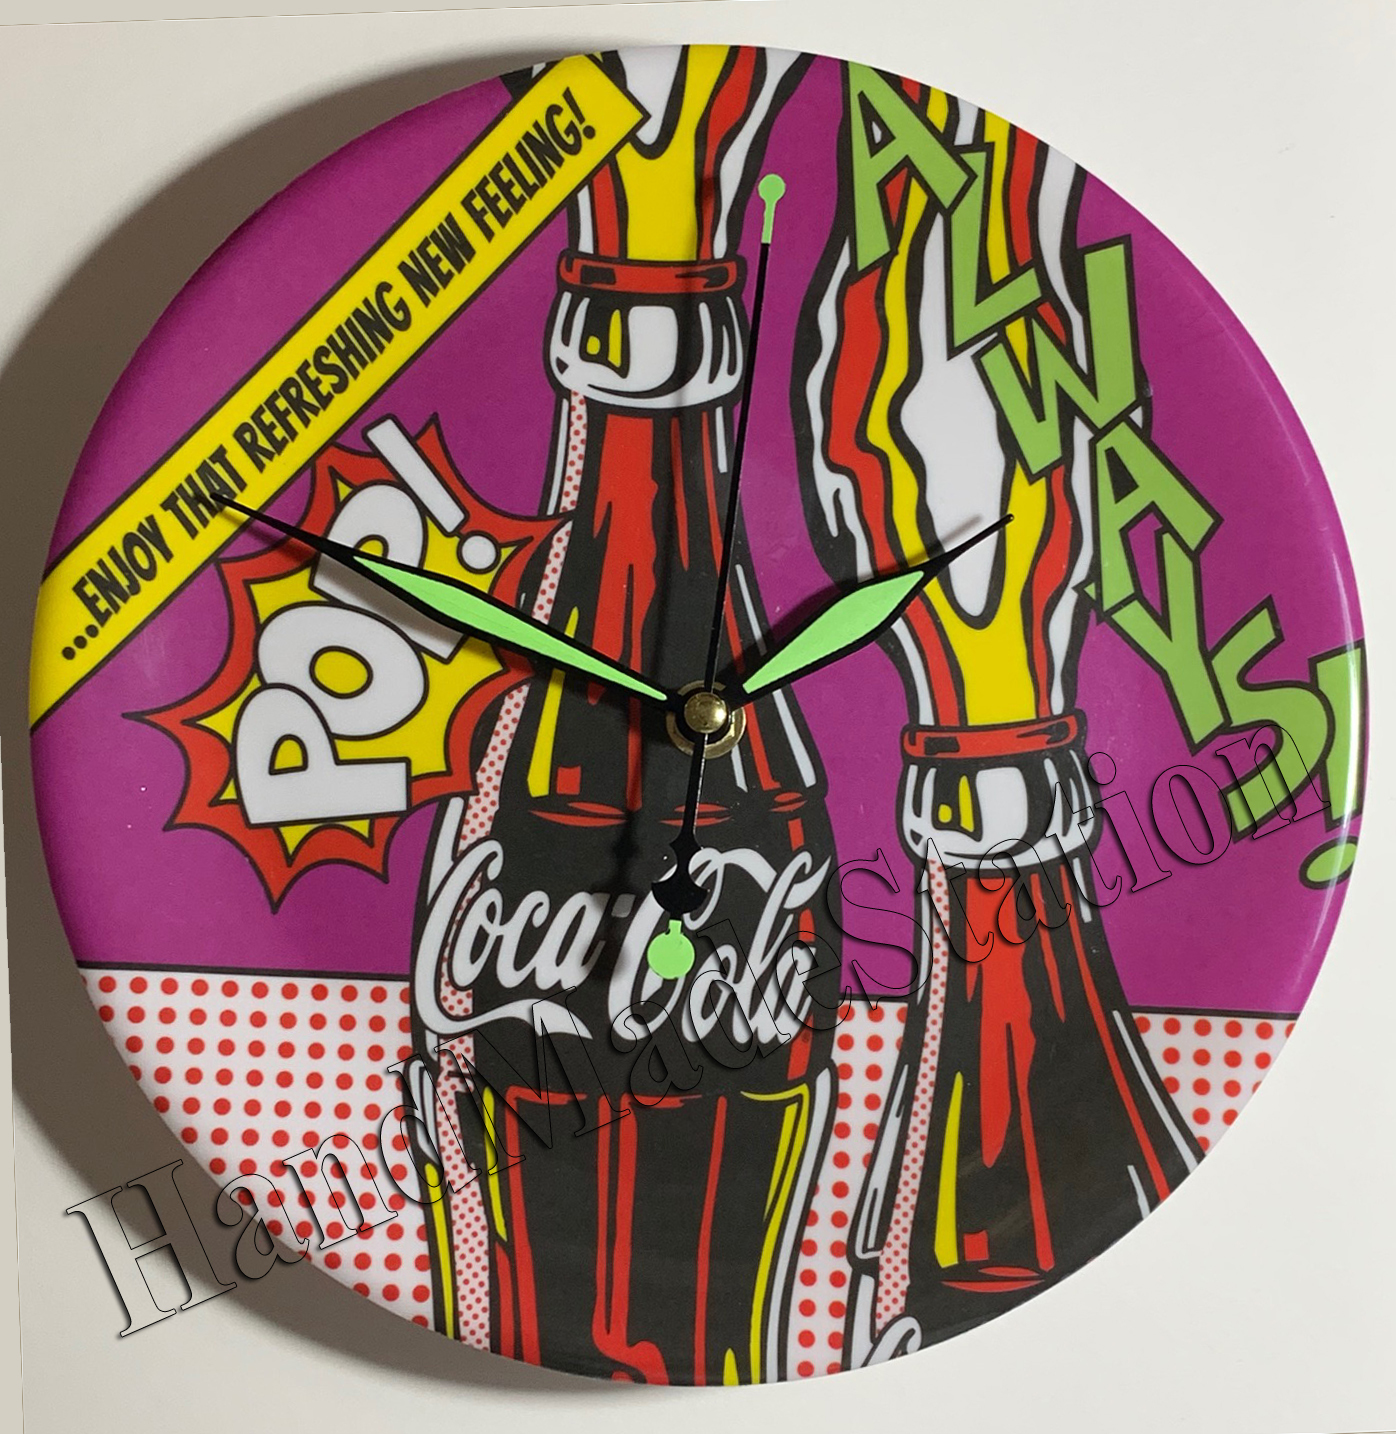 Coke circl pop wall clock2